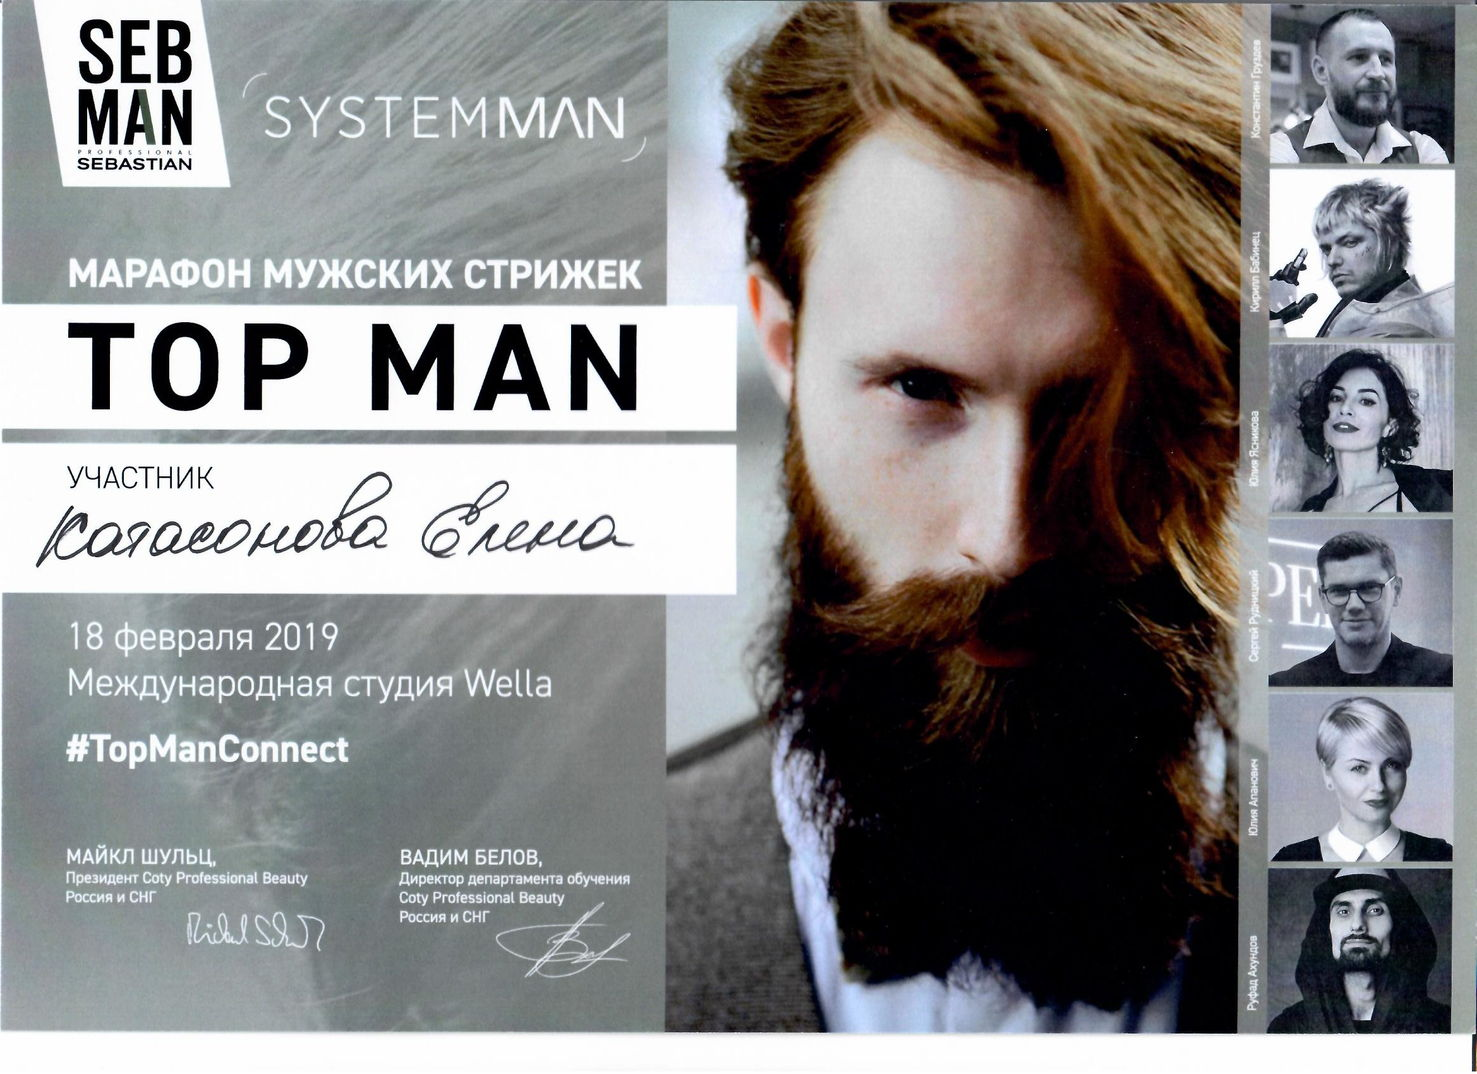 2019 марафон мужских стрижек Top Man wella